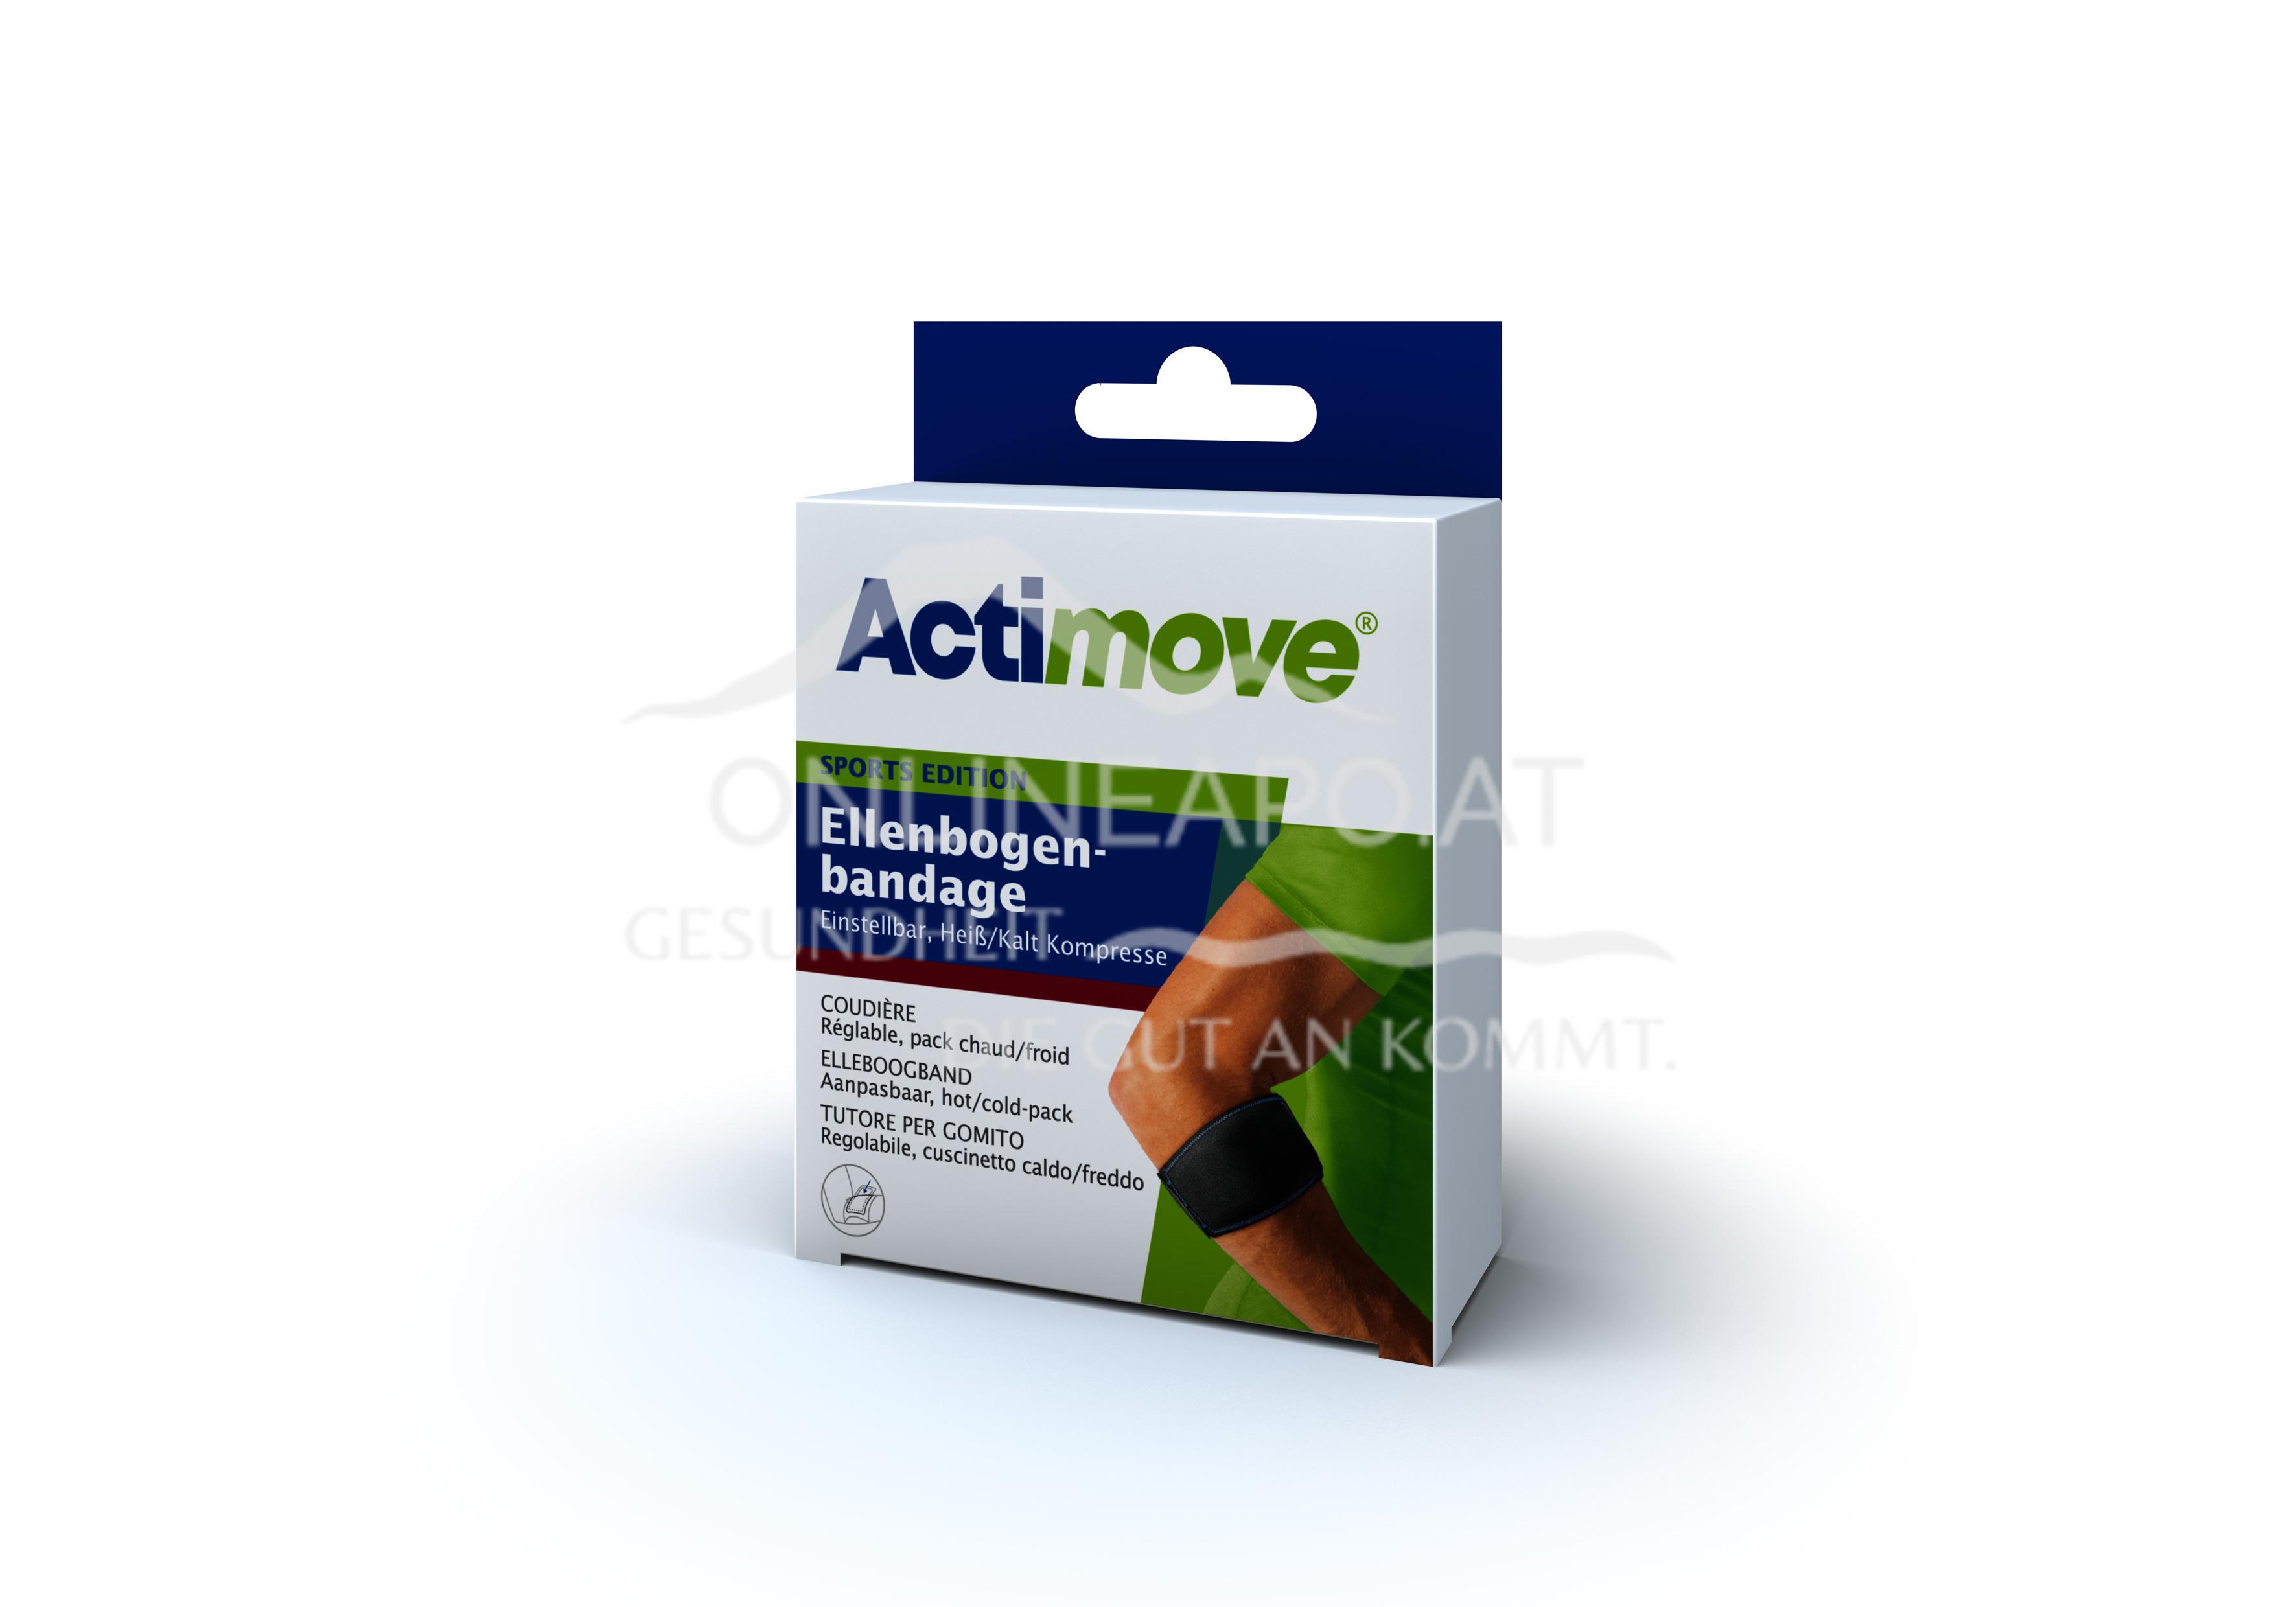 Actimove® Sport Edition Ellenbogenbandage Einstellbar, Heiß/Kalt Kompresse